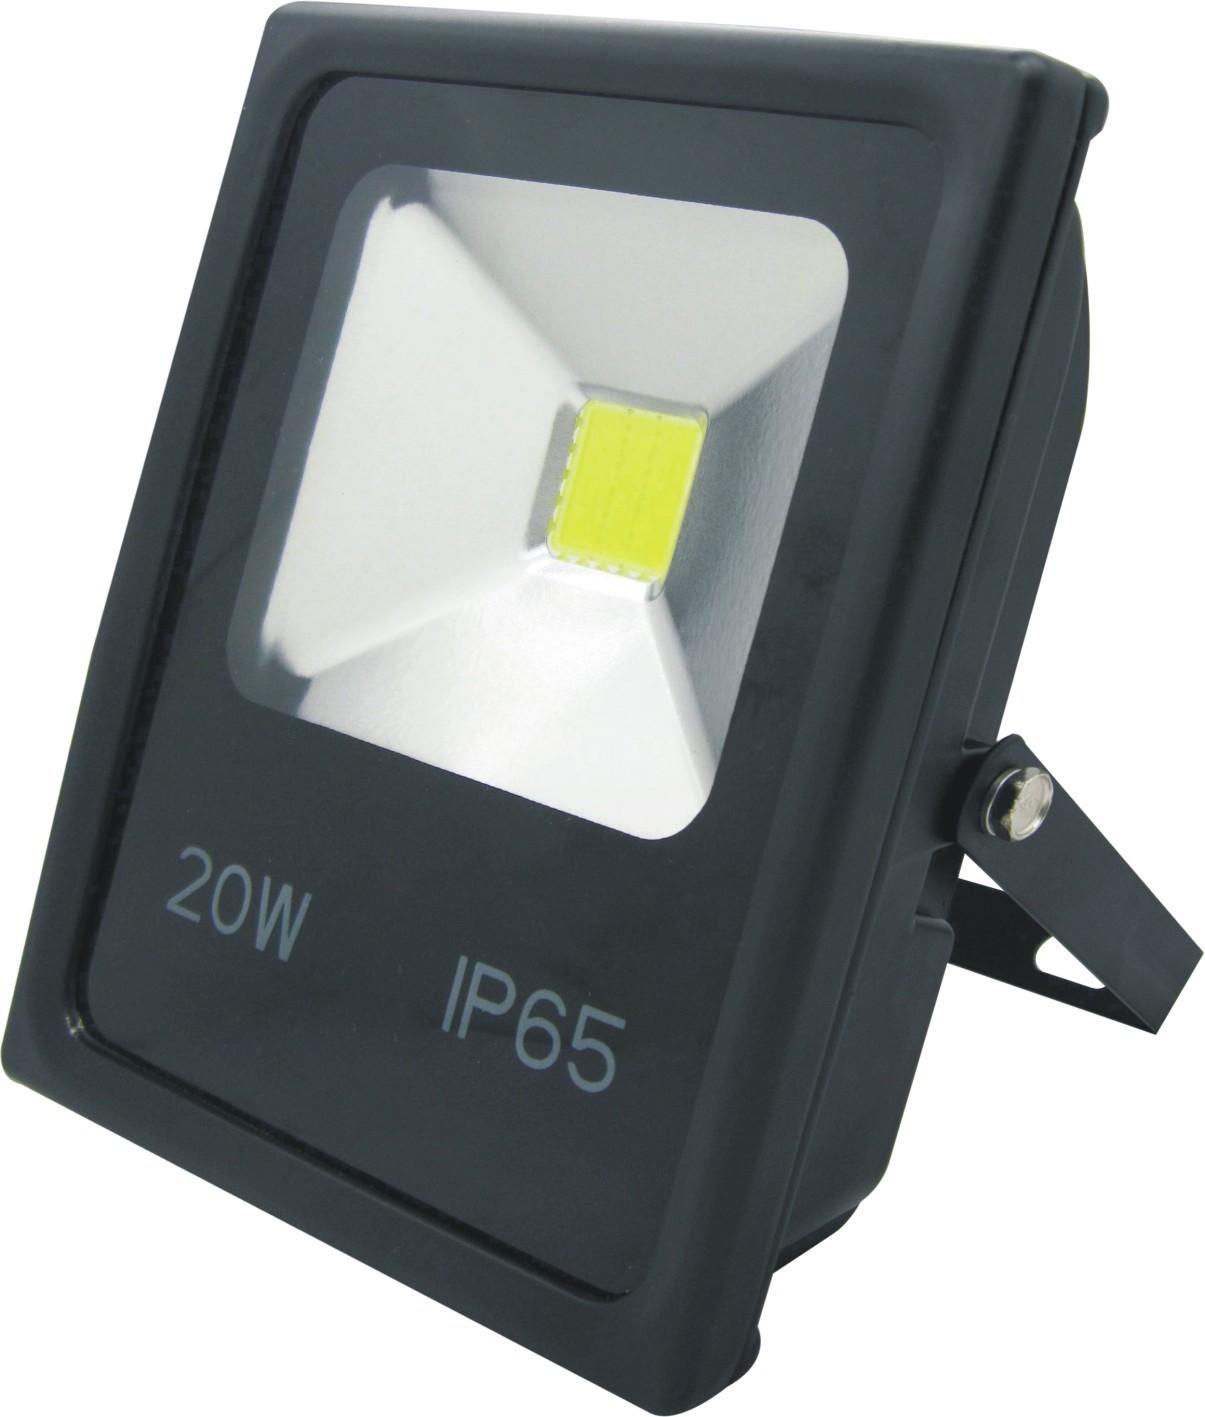 ED投光灯-ASIA 亚之洲照明 LED集成投光灯1